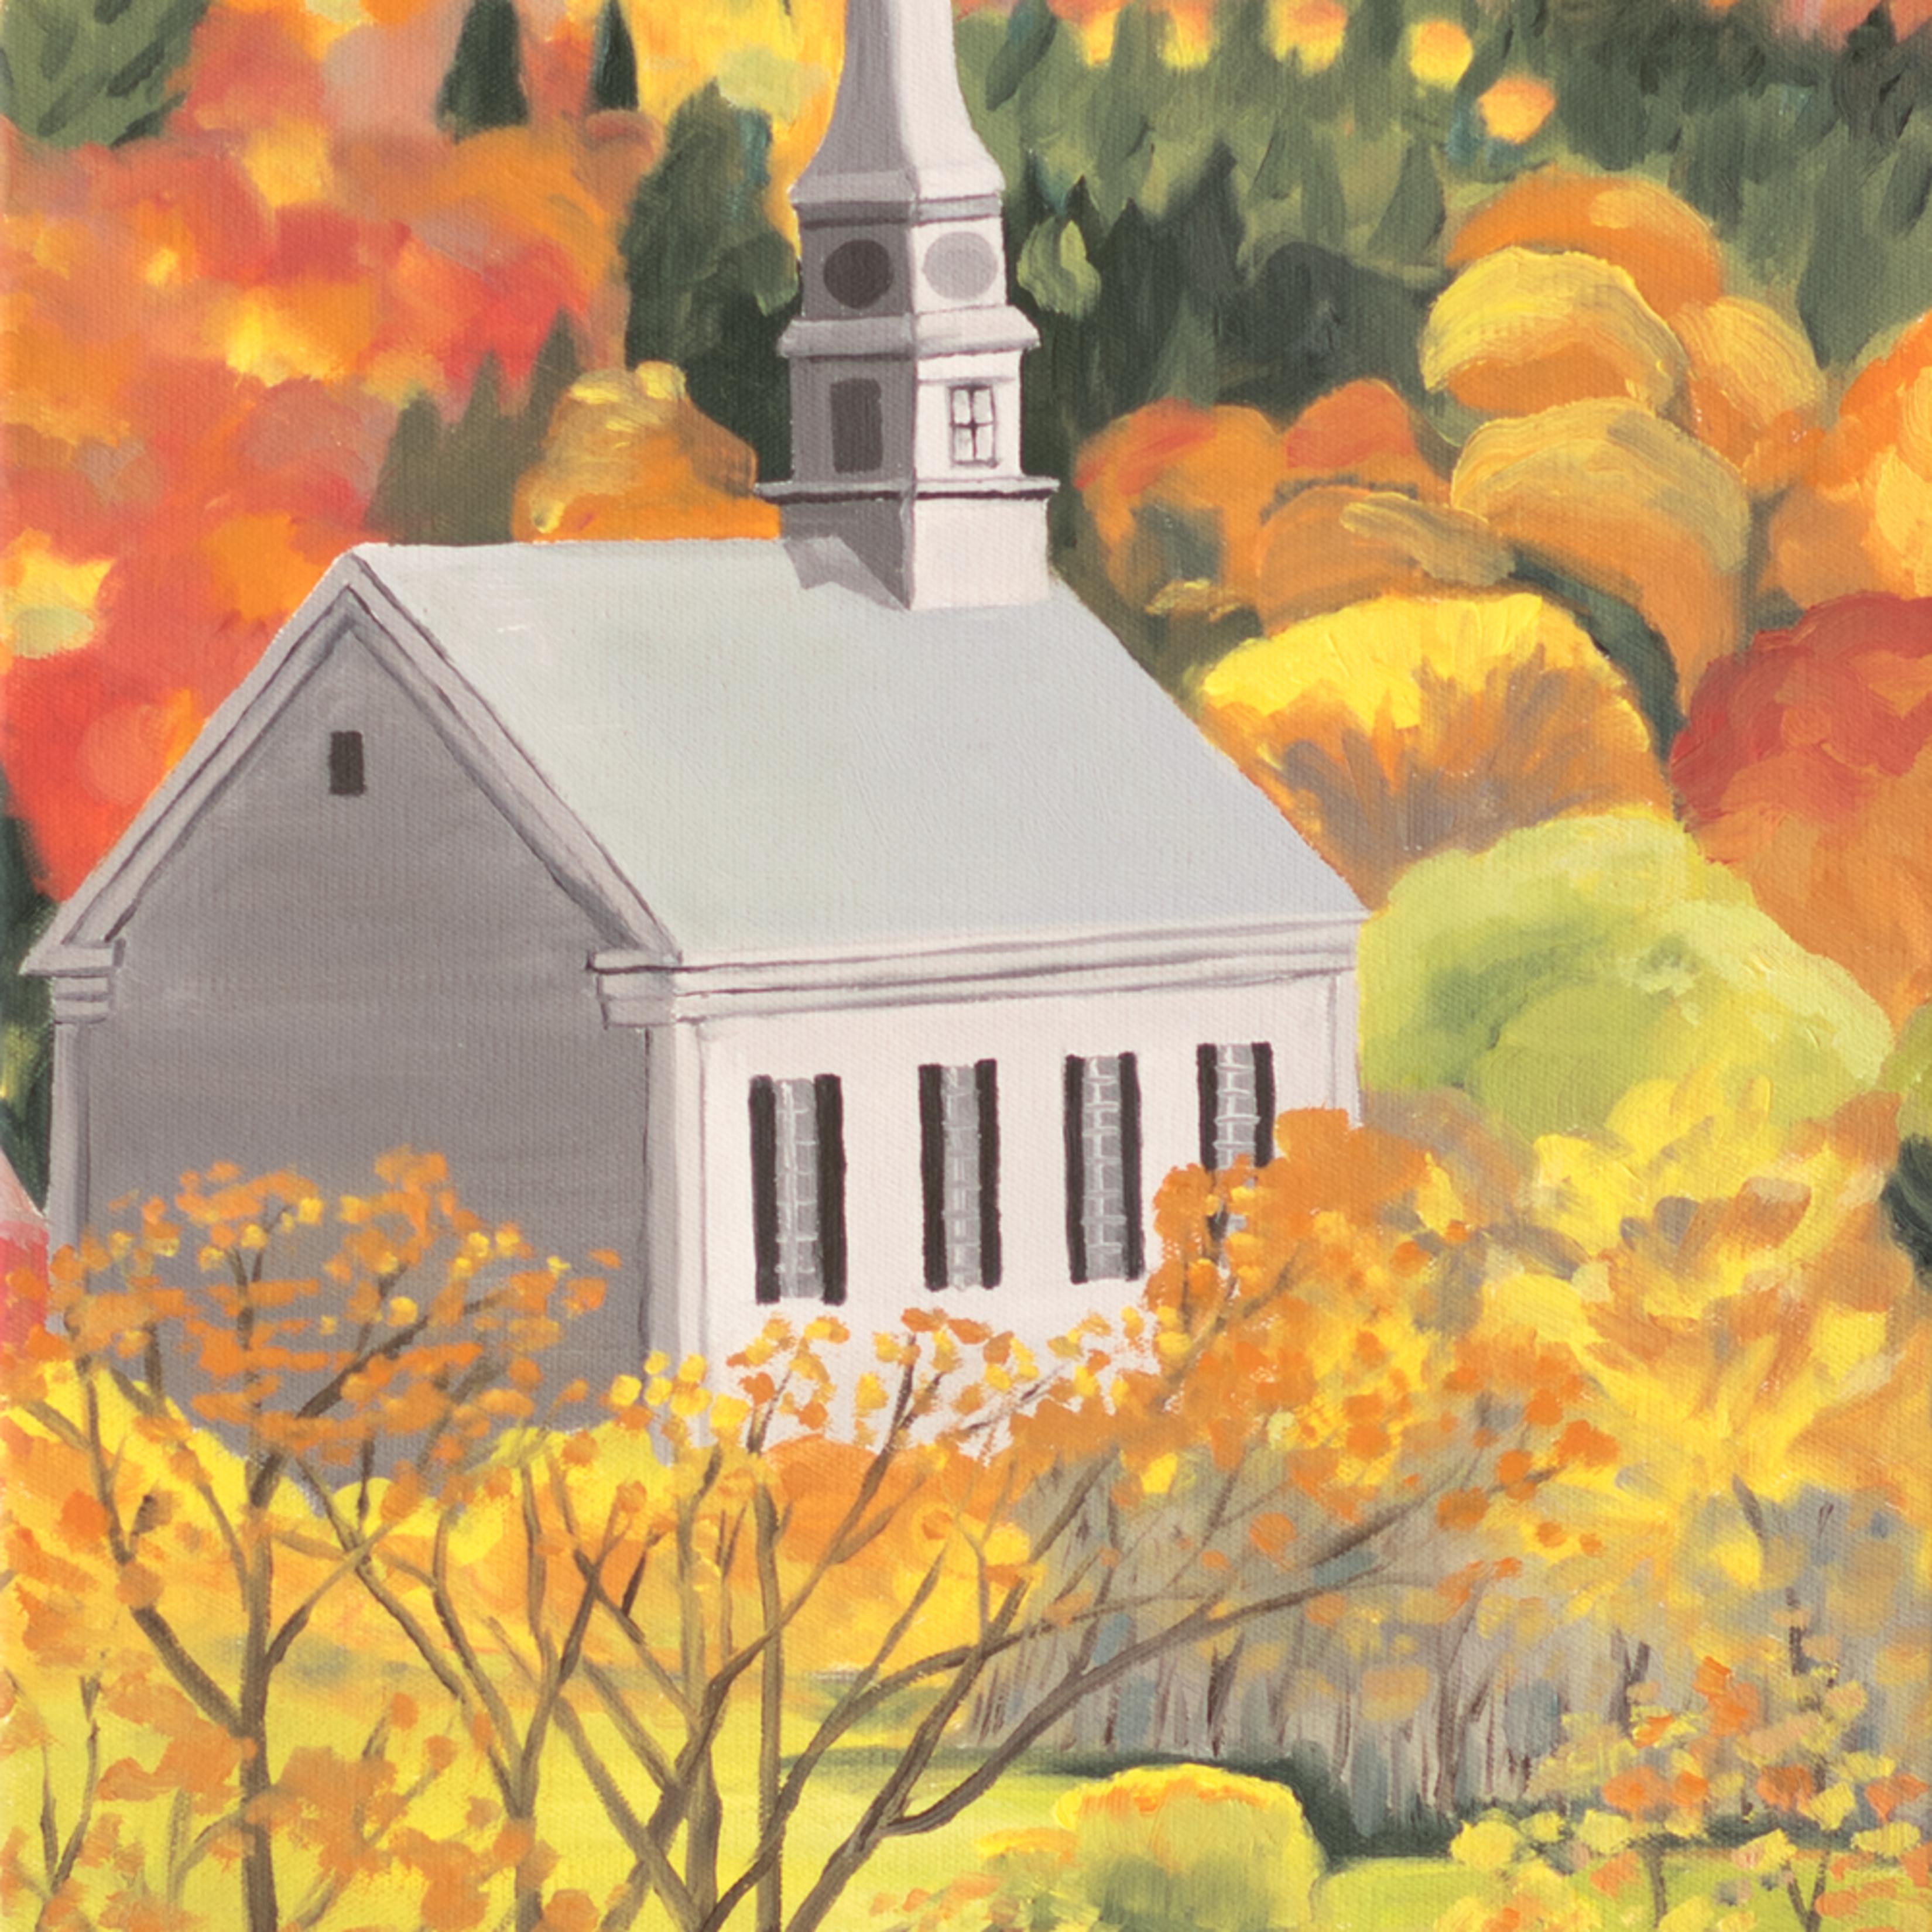 Stowe community church tyqsfh